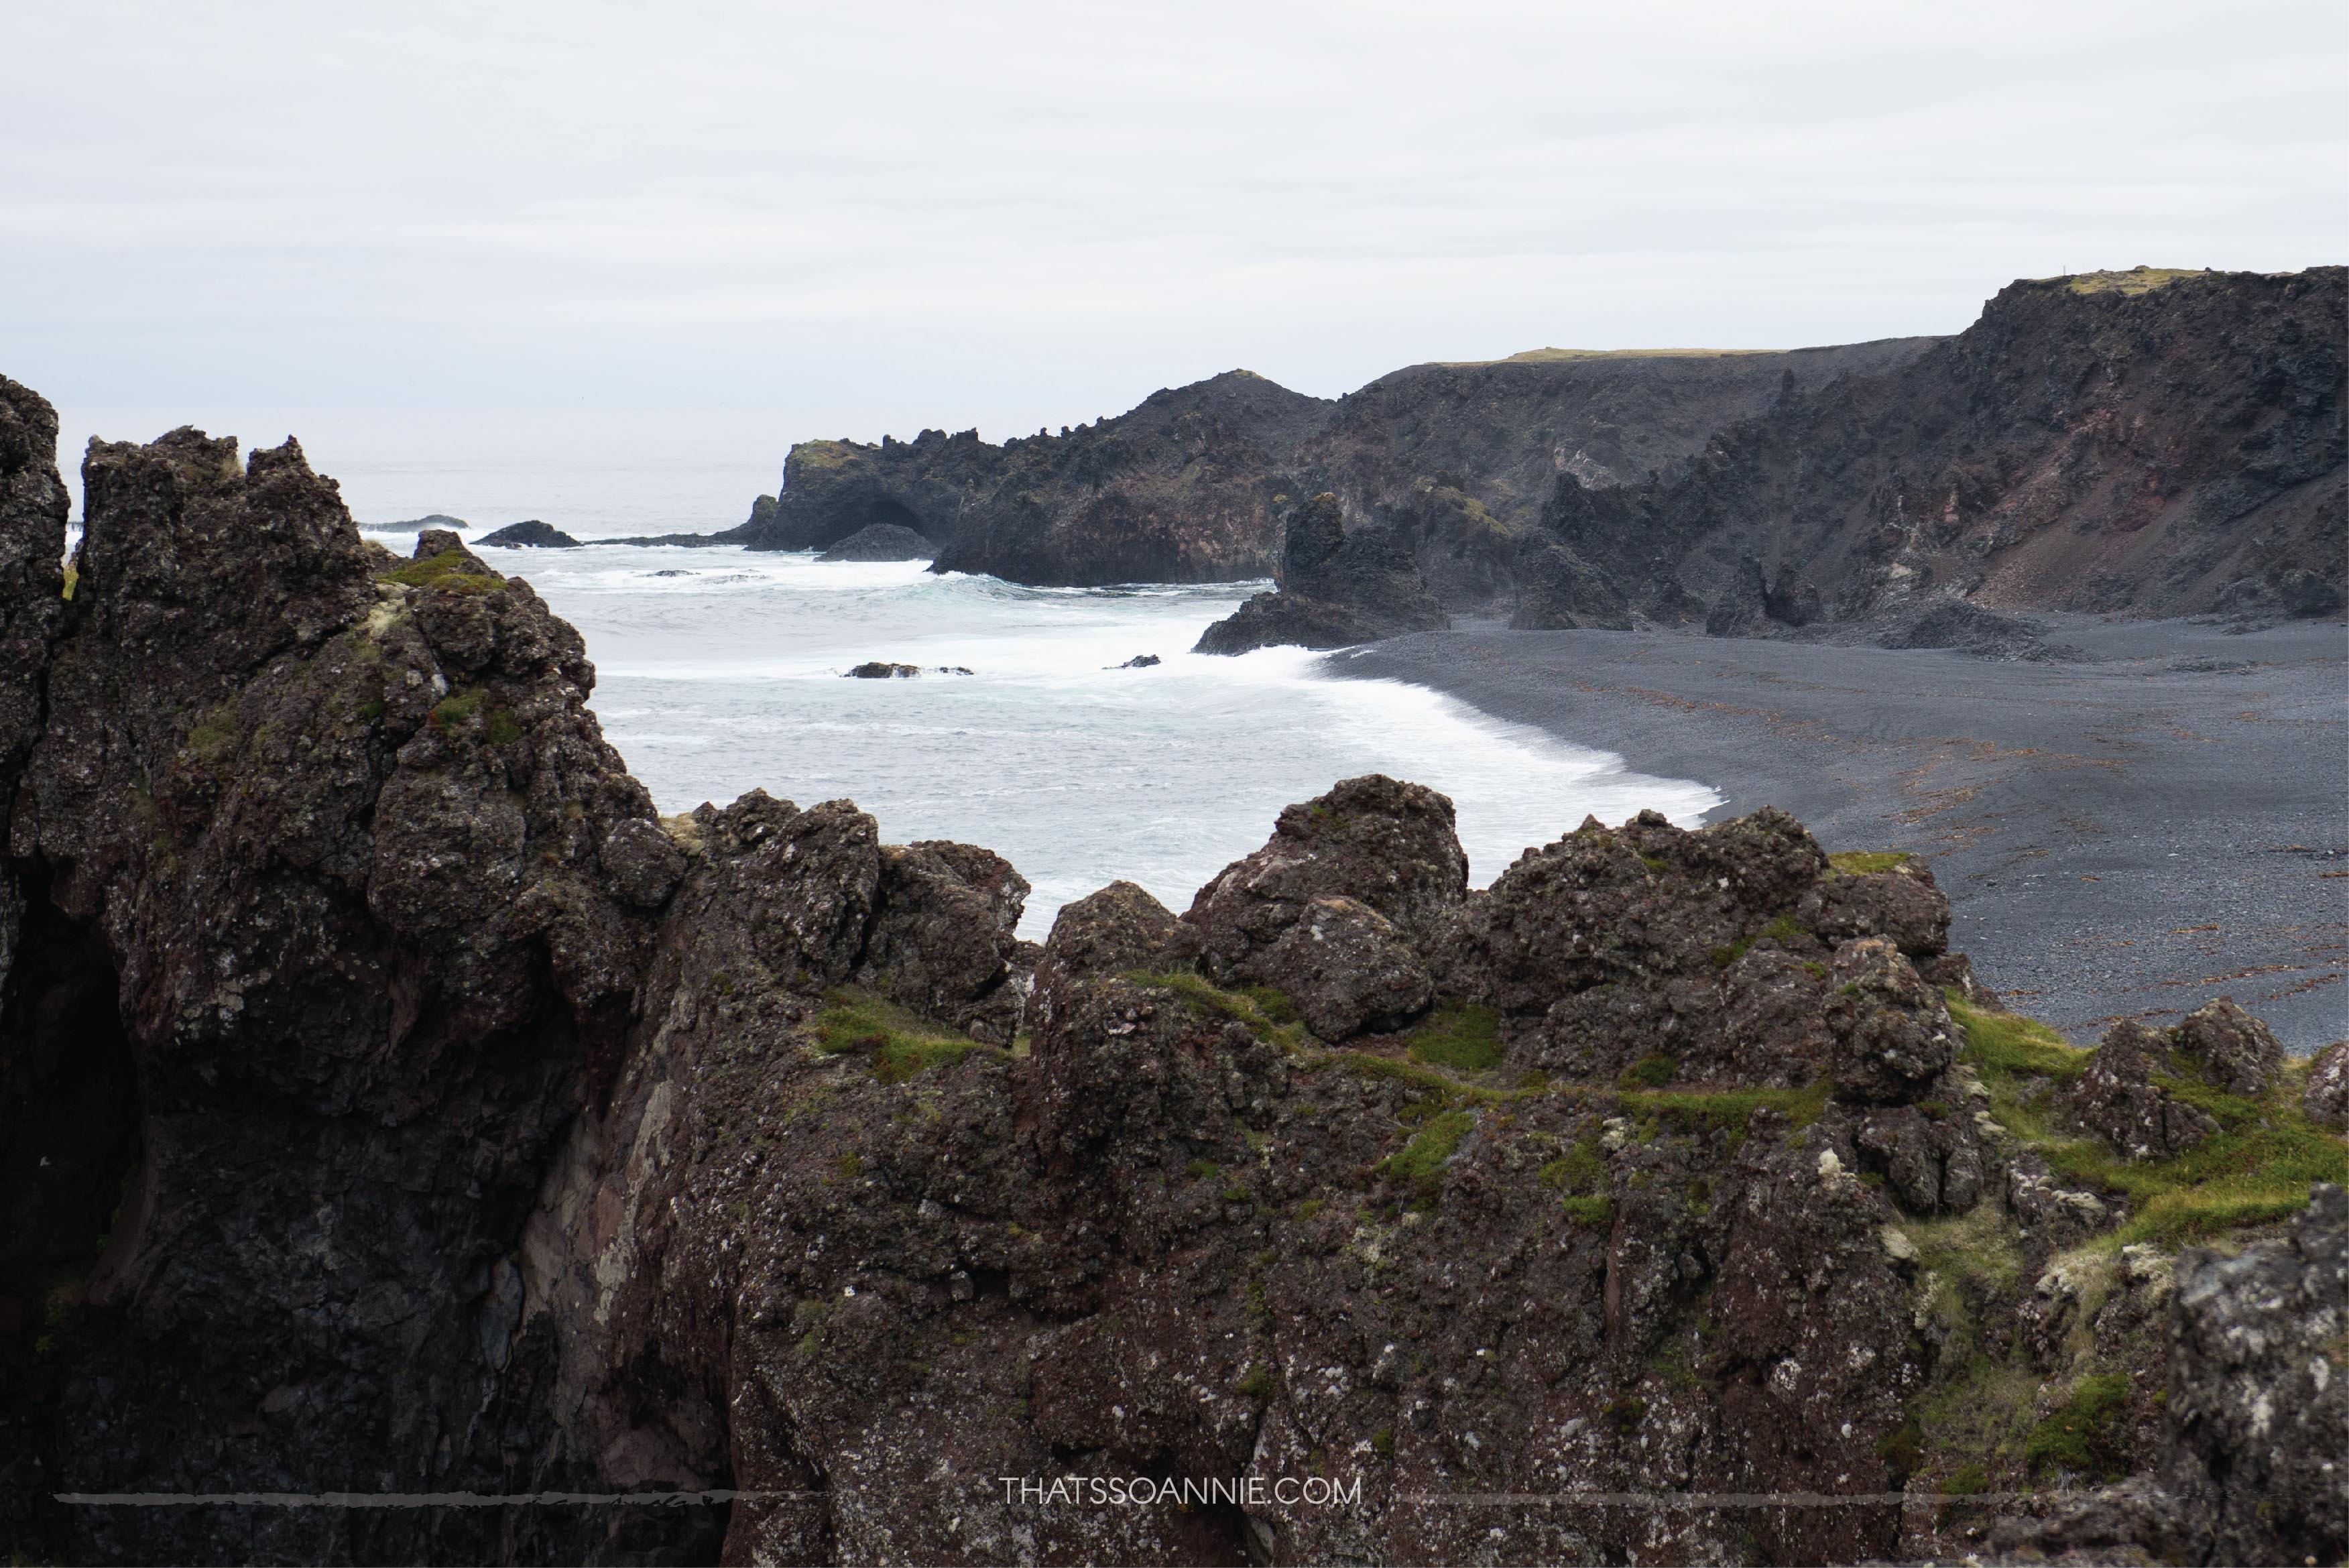 An easy trail leads down from the parking lot towards Djúpalónssandur, a black pebble beach | Exploring the Snæfellsnes Peninsula, Iceland | www.thatssoannie.com